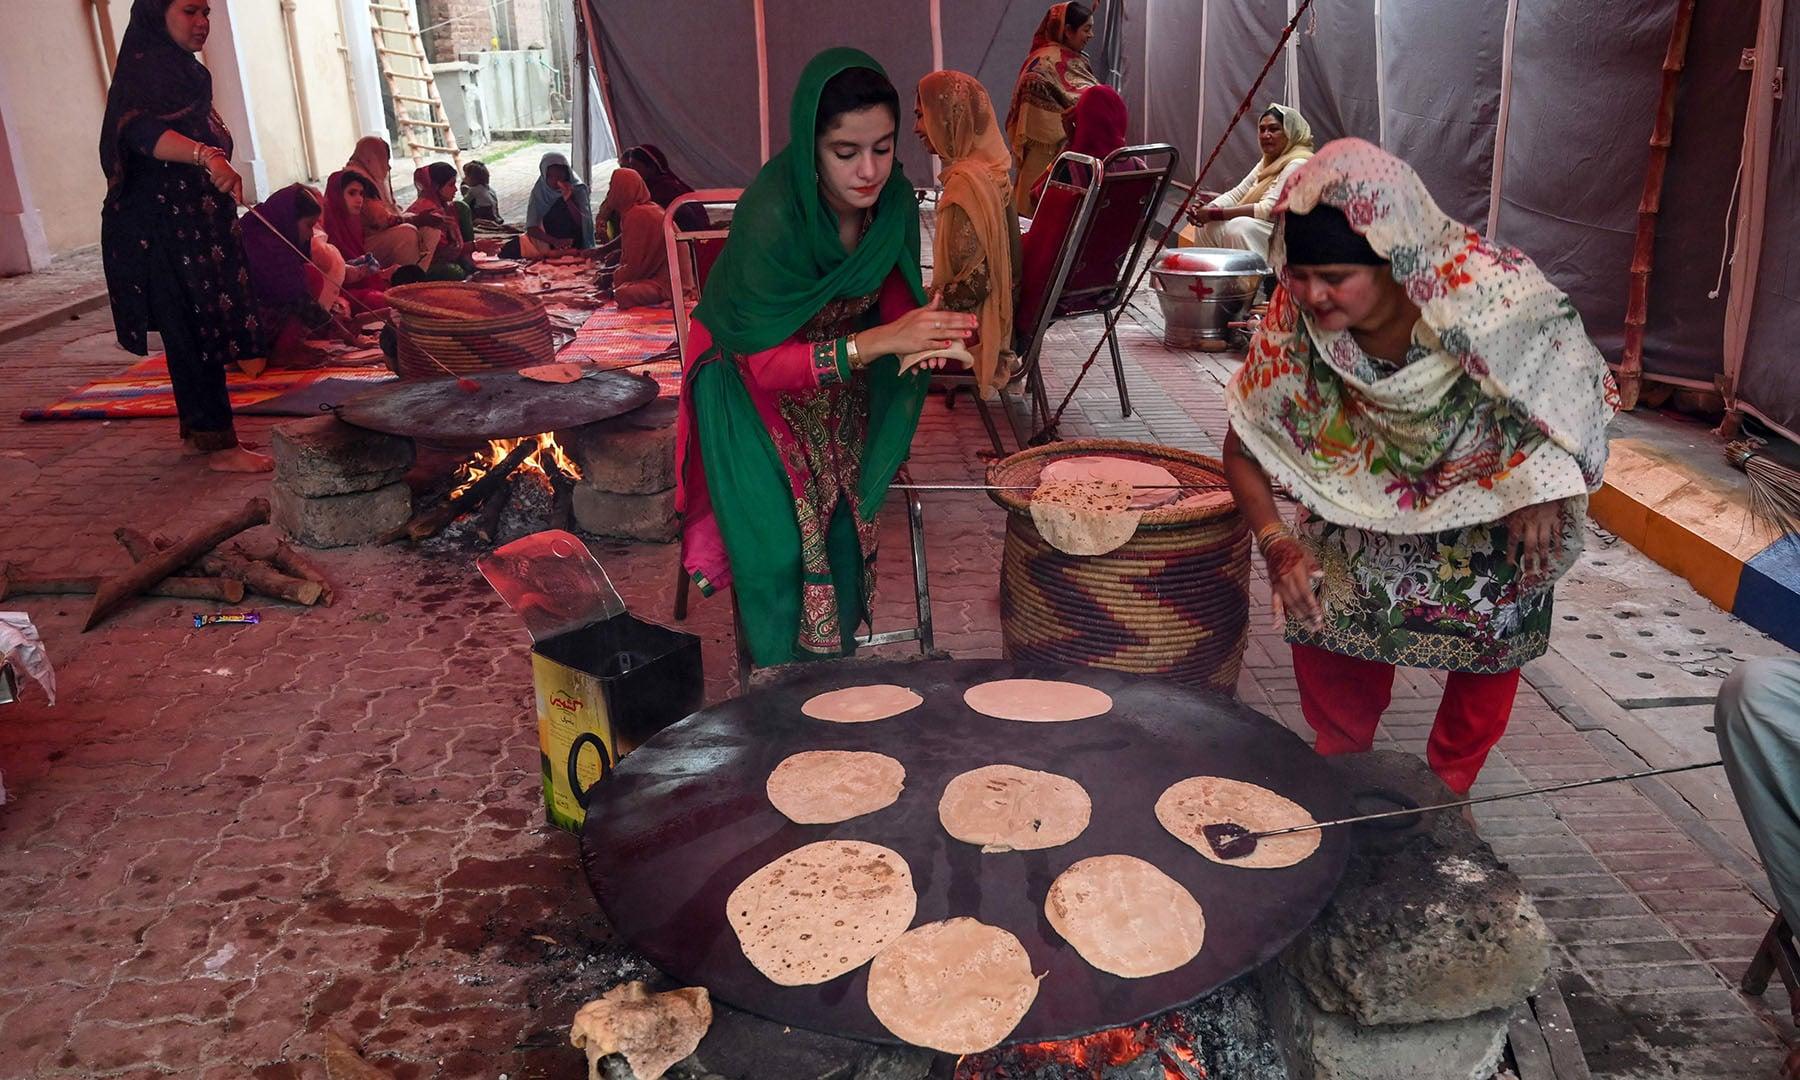 Sikh pilgrims prepare bread for devotees at a shrine in Nankana Sahib, some 75 km west of Lahore, on November 7. — AFP